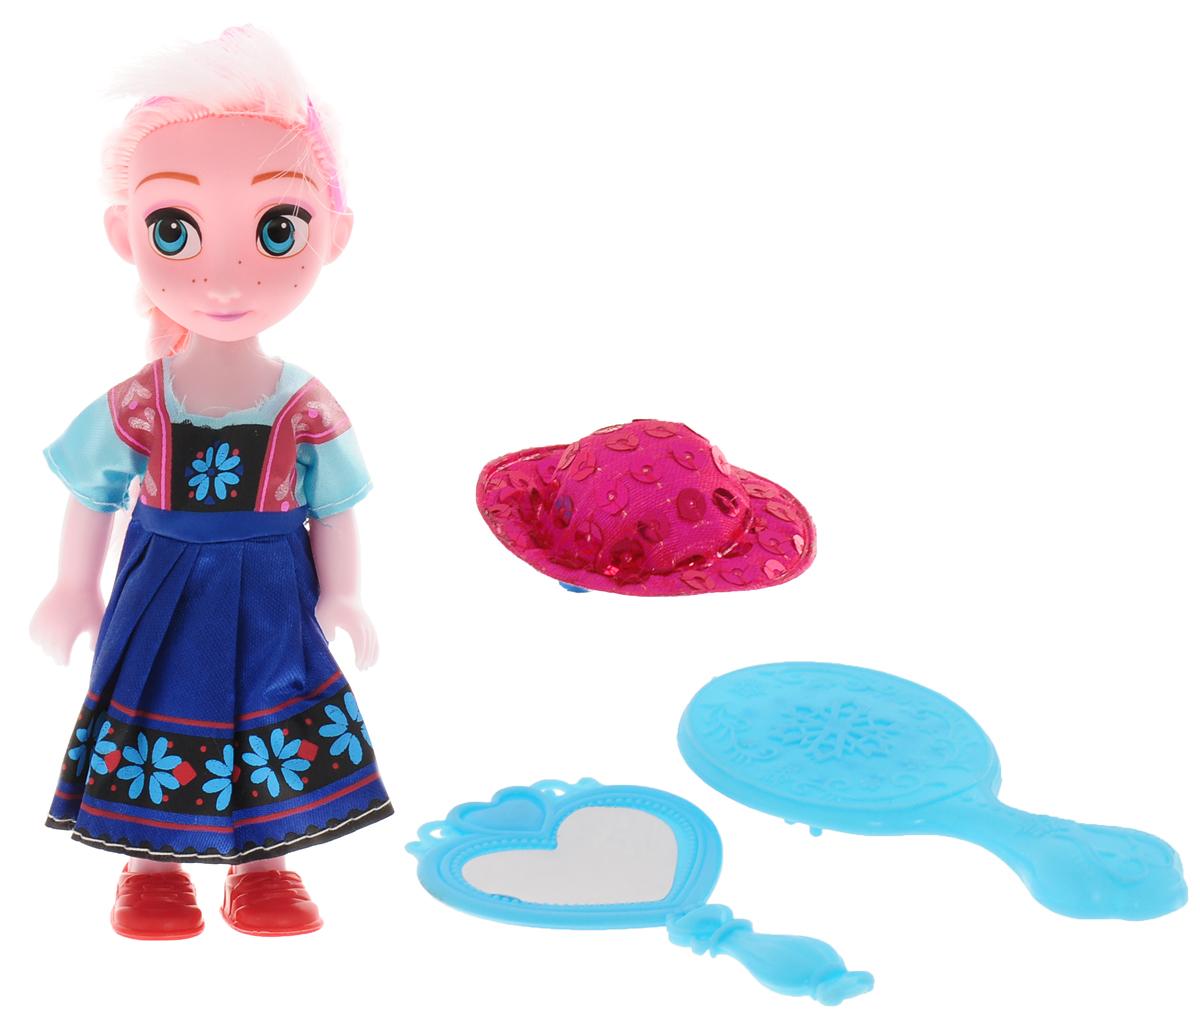 Город игр Мини-кукла Элис с аксессуарами ваша шляпка берет